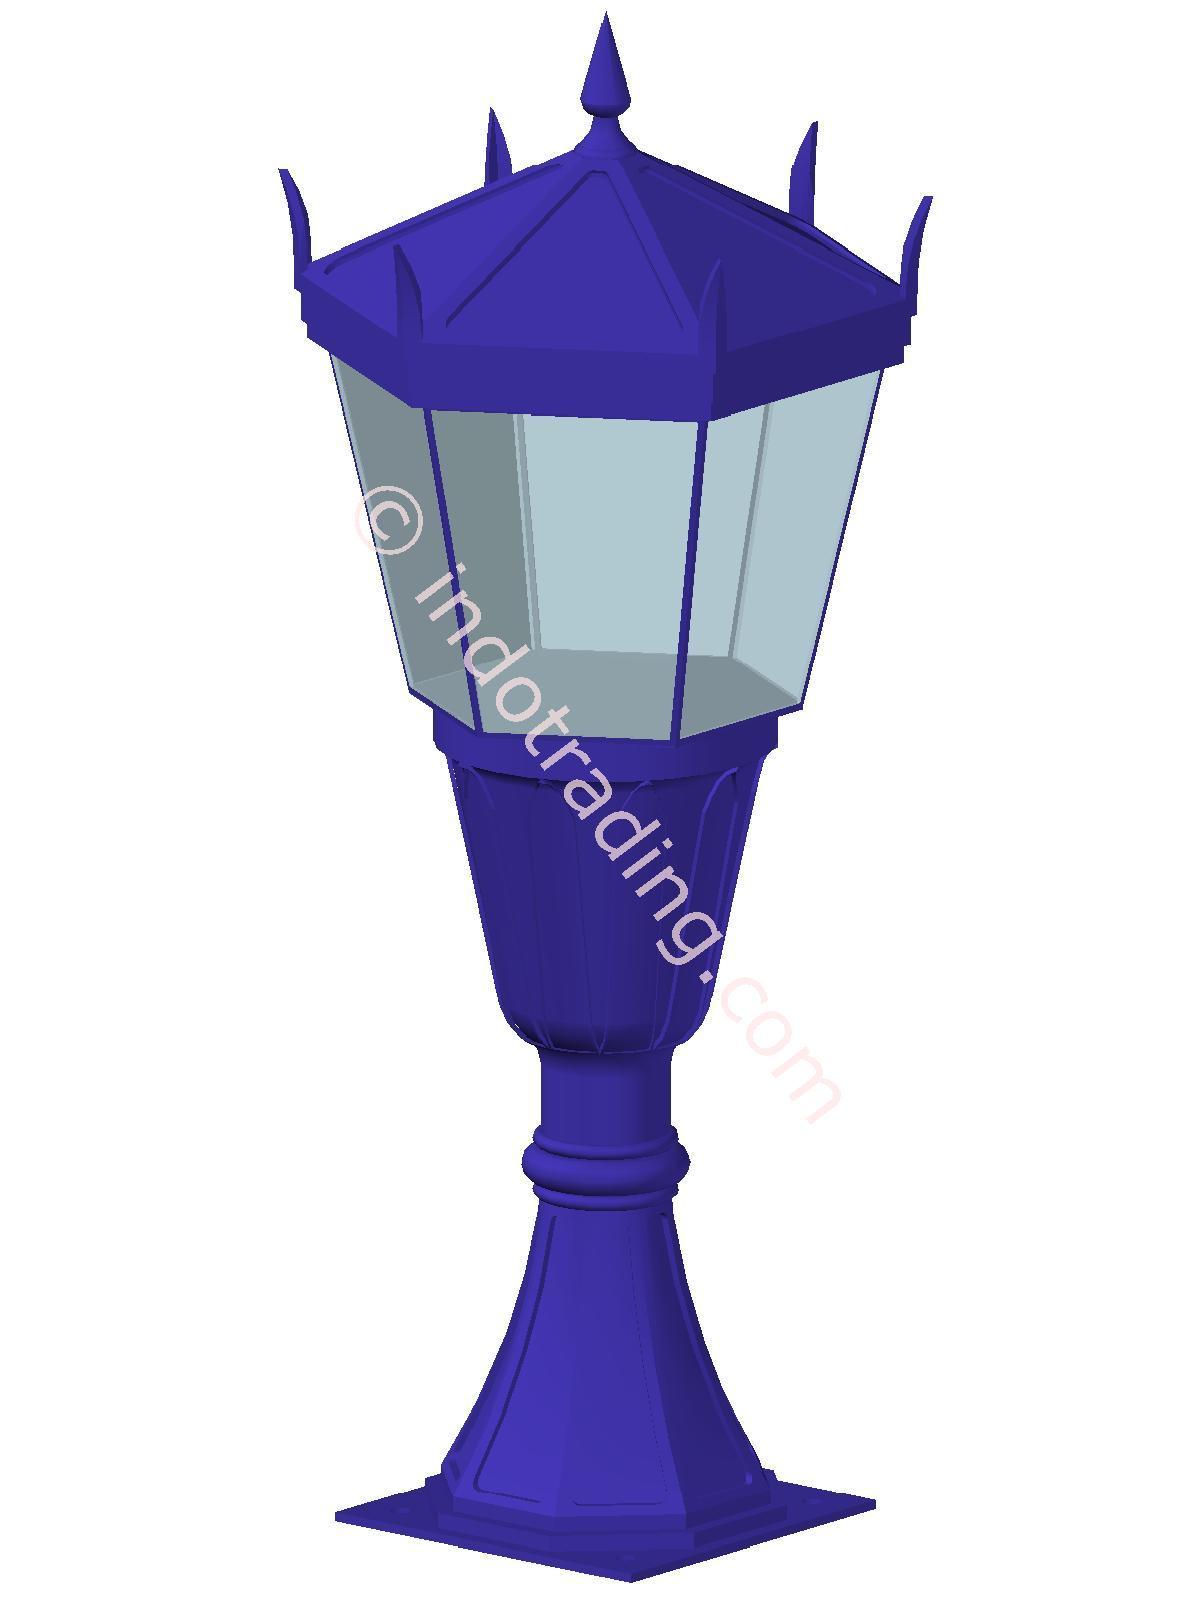 Terkini 24+ Lampu Pilar Rumah Murah